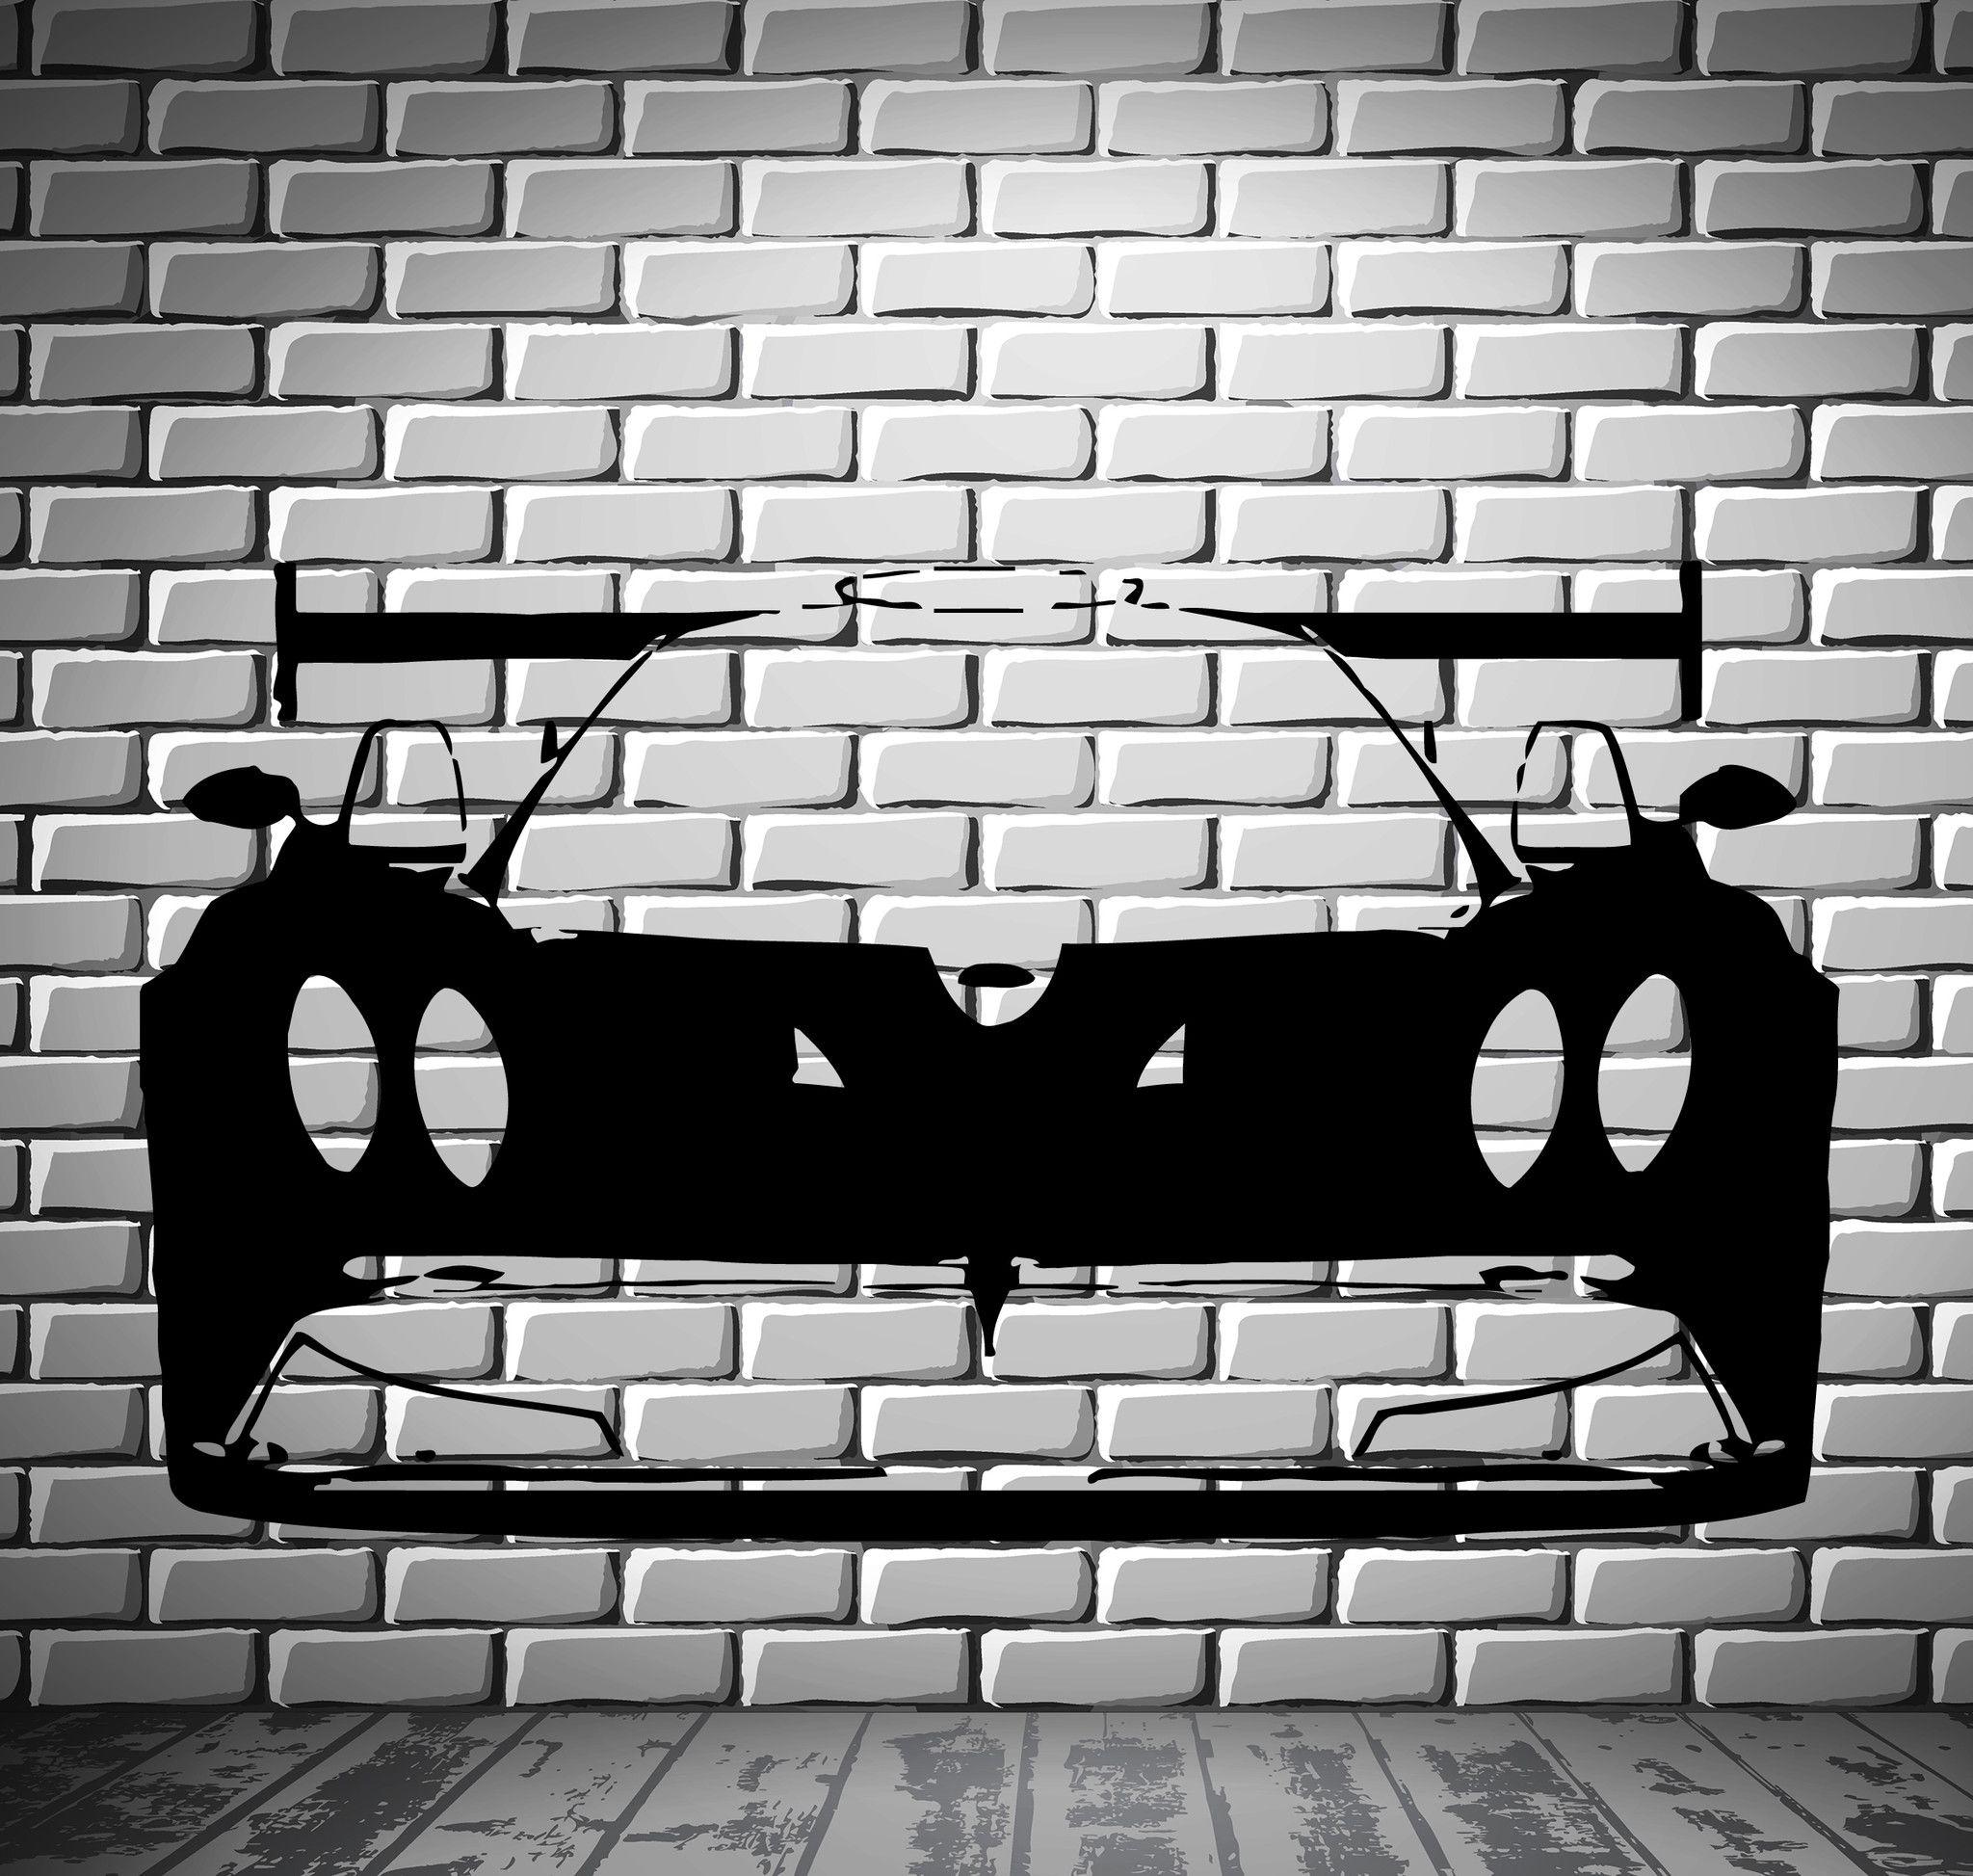 Pagani Zonda Roadster Super Cars Racing Wall Mural Vinyl Art